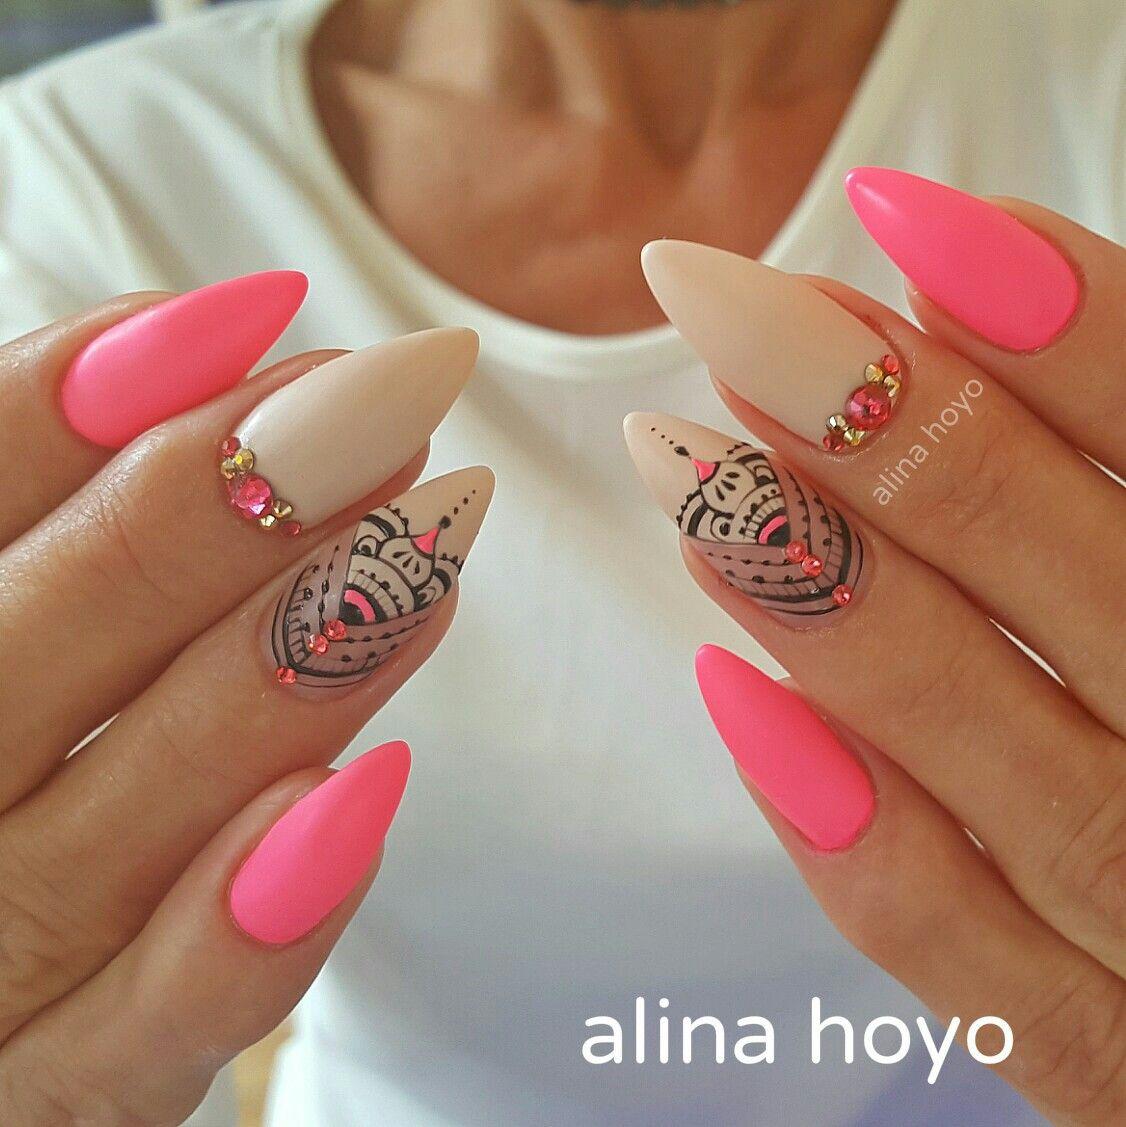 Pin de Laura Jurika en nails | Pinterest | Diseños de uñas, Arte de ...